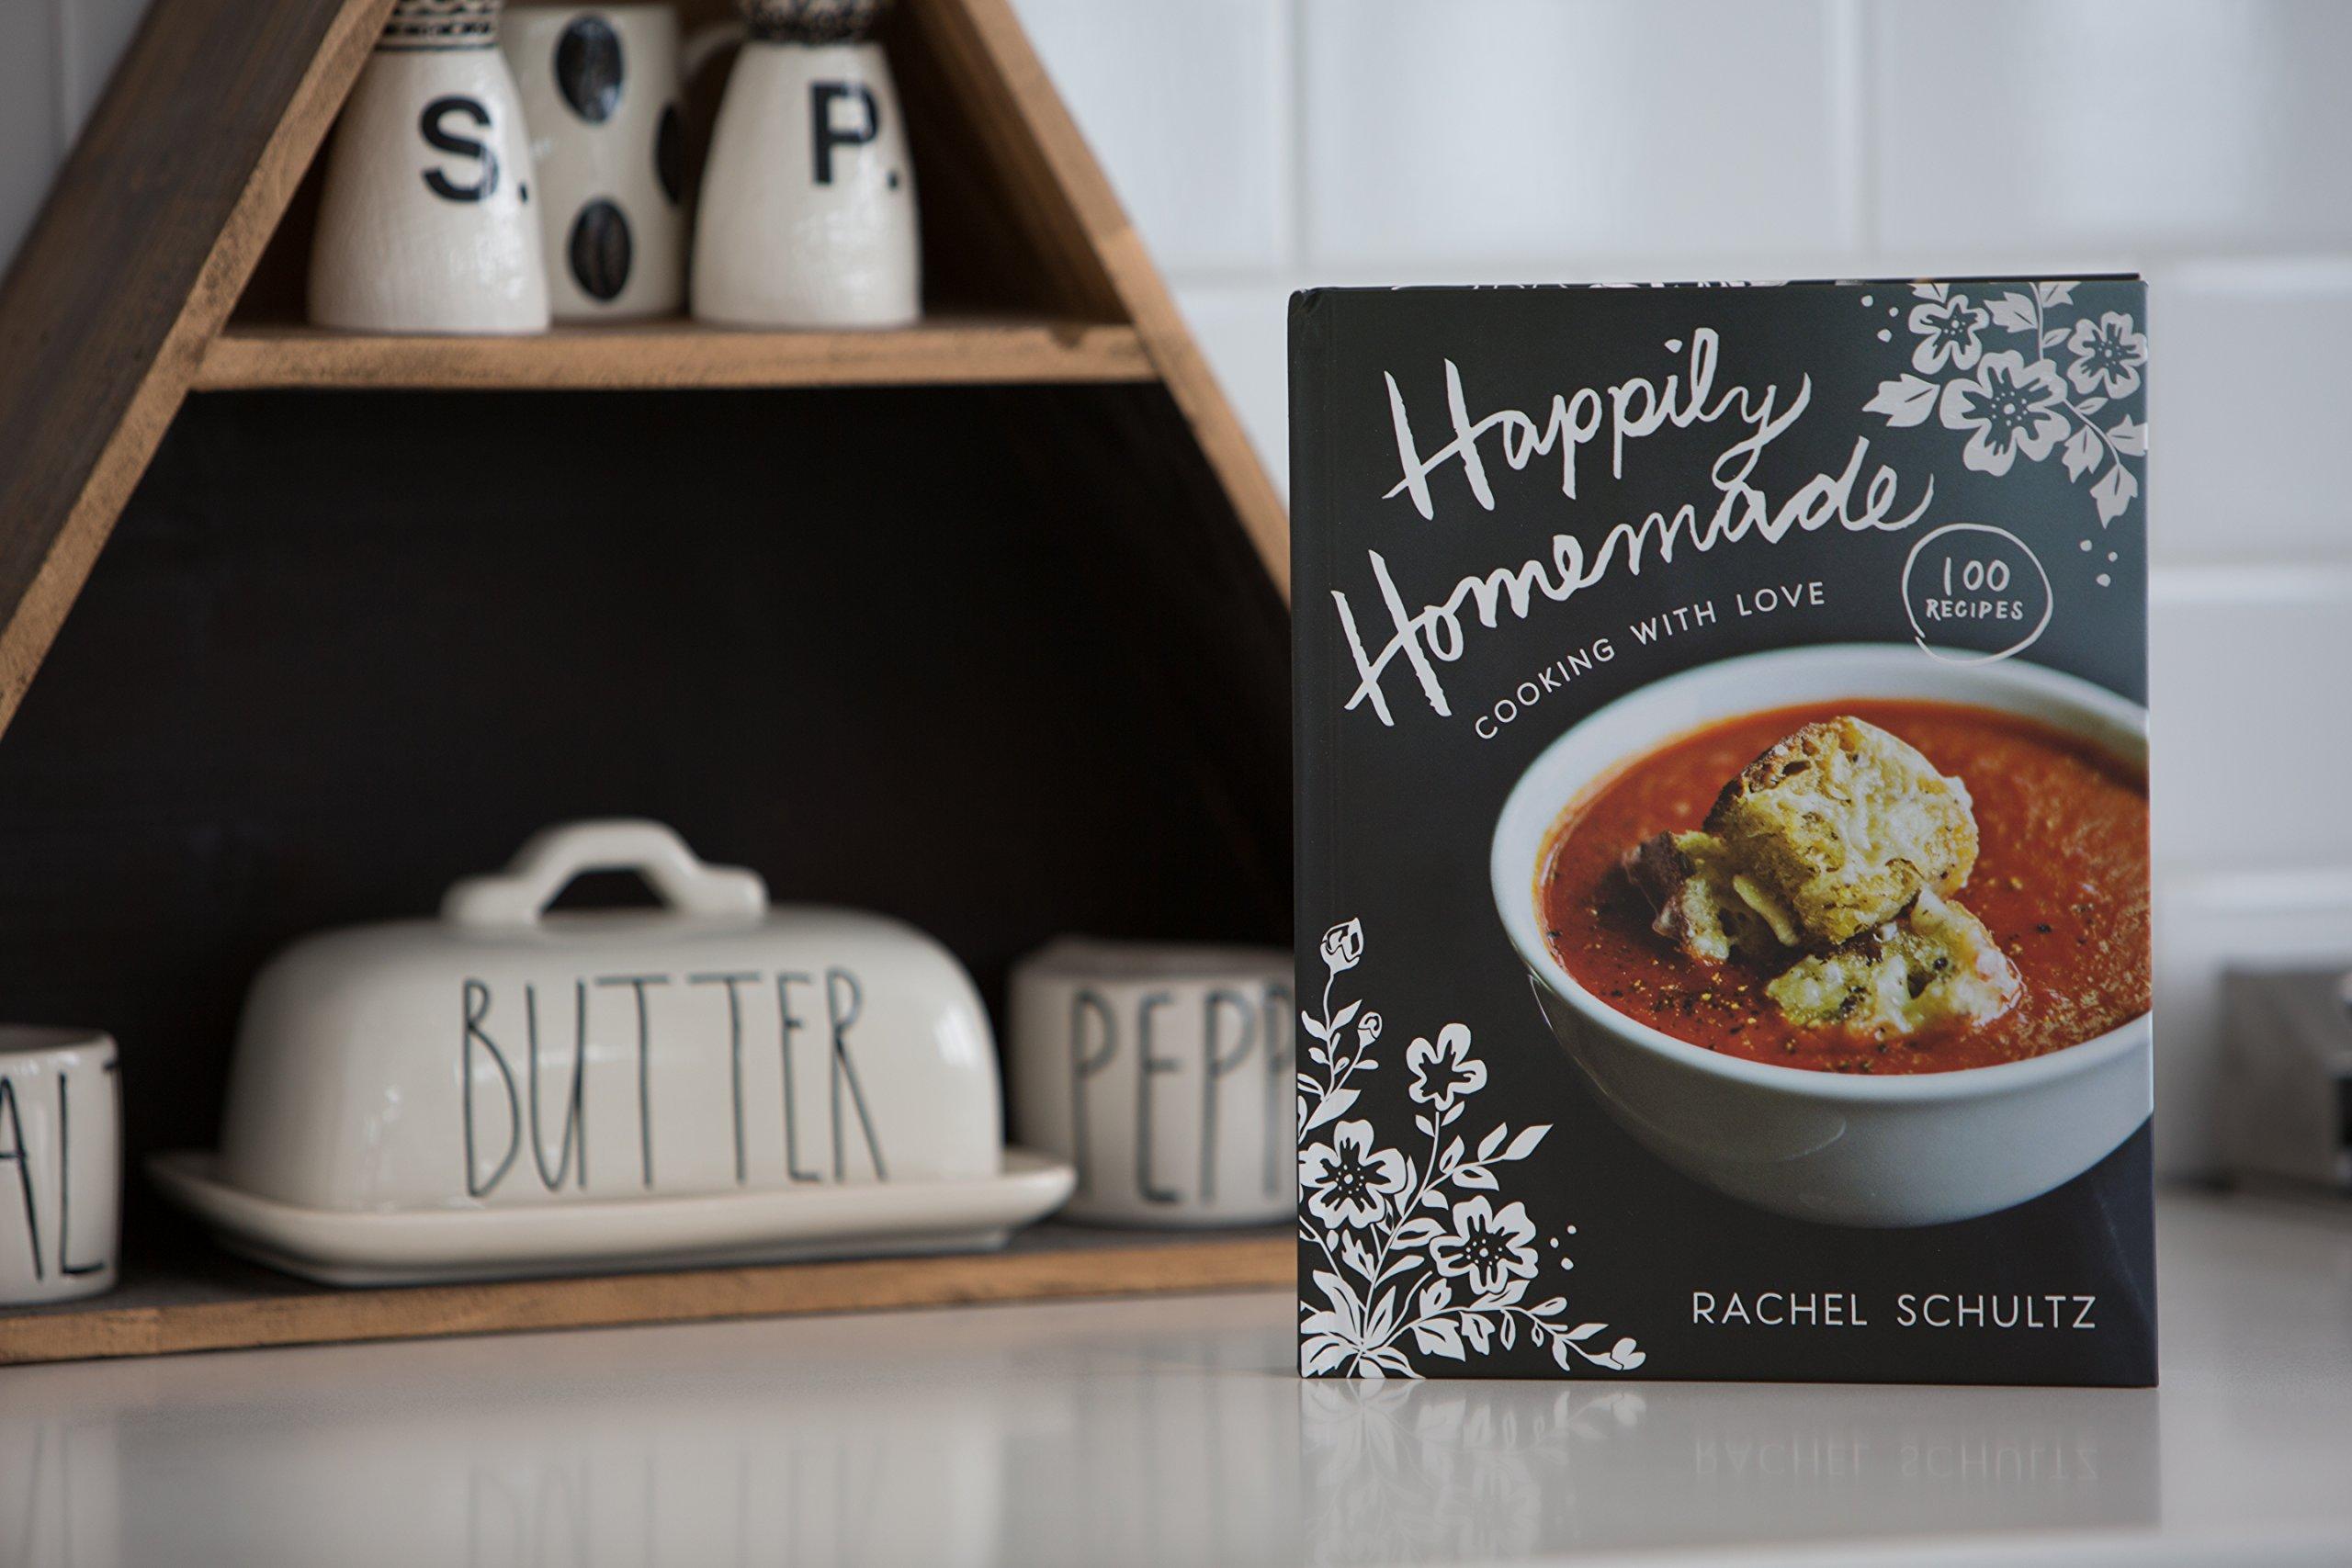 Happily Homemade: Cooking With Love: Rachel Schultz: 0025986357122:  Amazon: Books